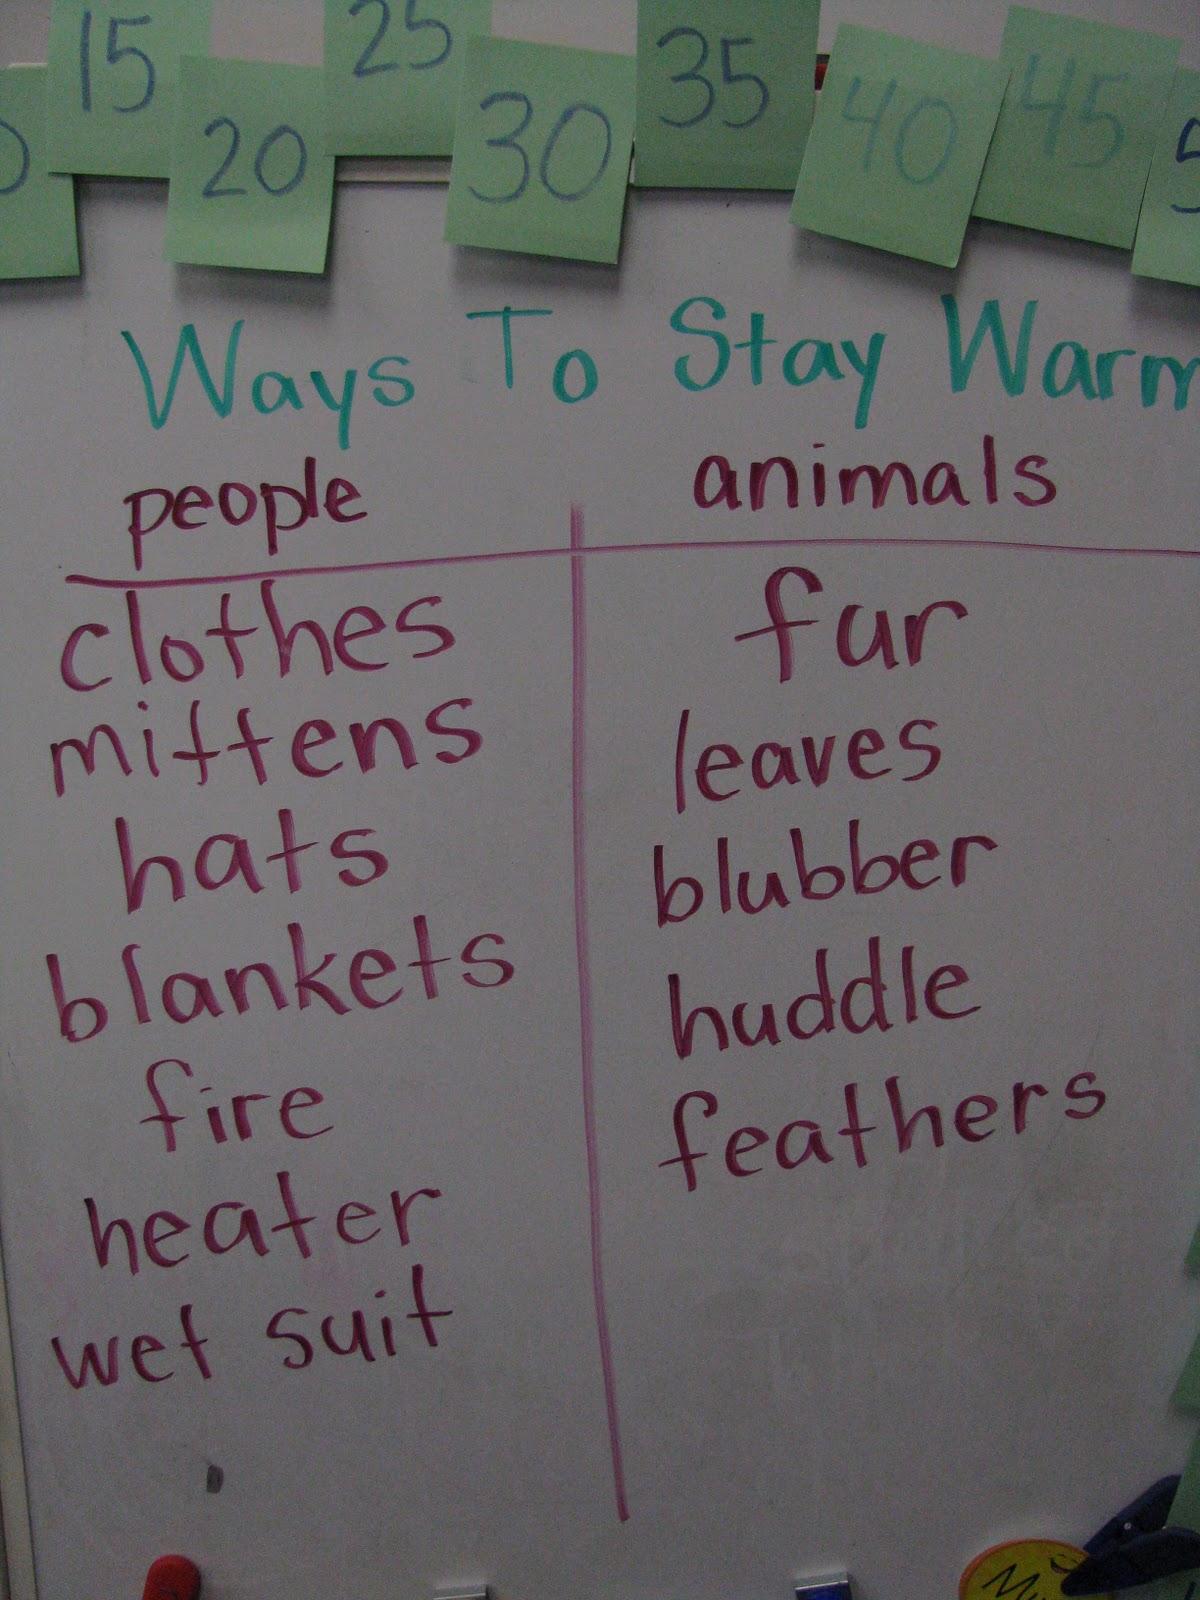 Tiller How Do Animals Stay Warm Blubber